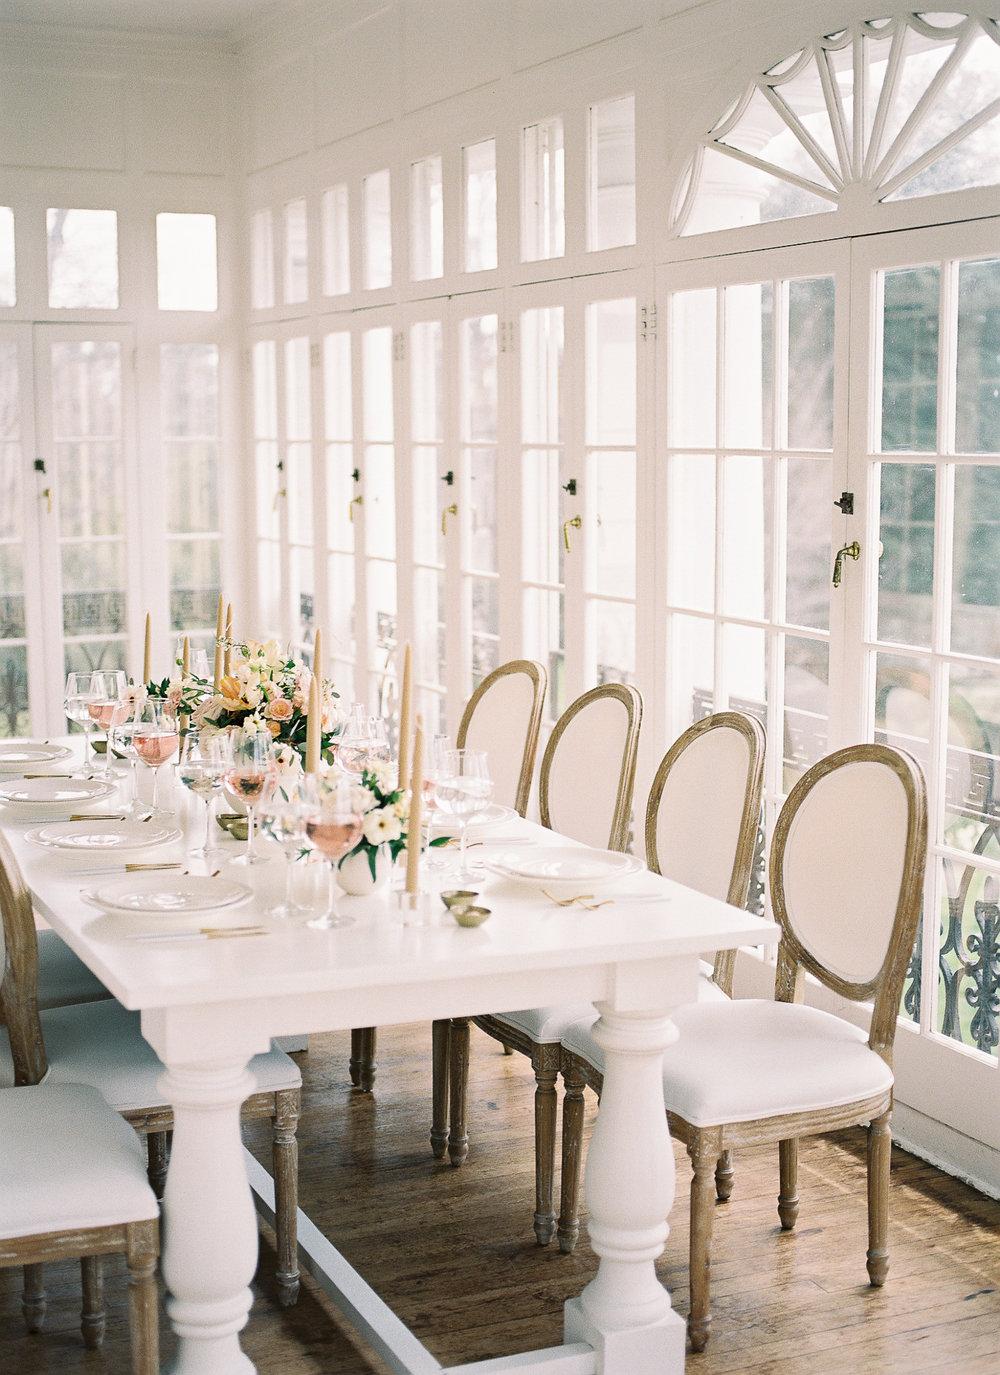 Glenview Mansion Wedding Venue  Lisamarieartistry.com (39 of 39).JPG